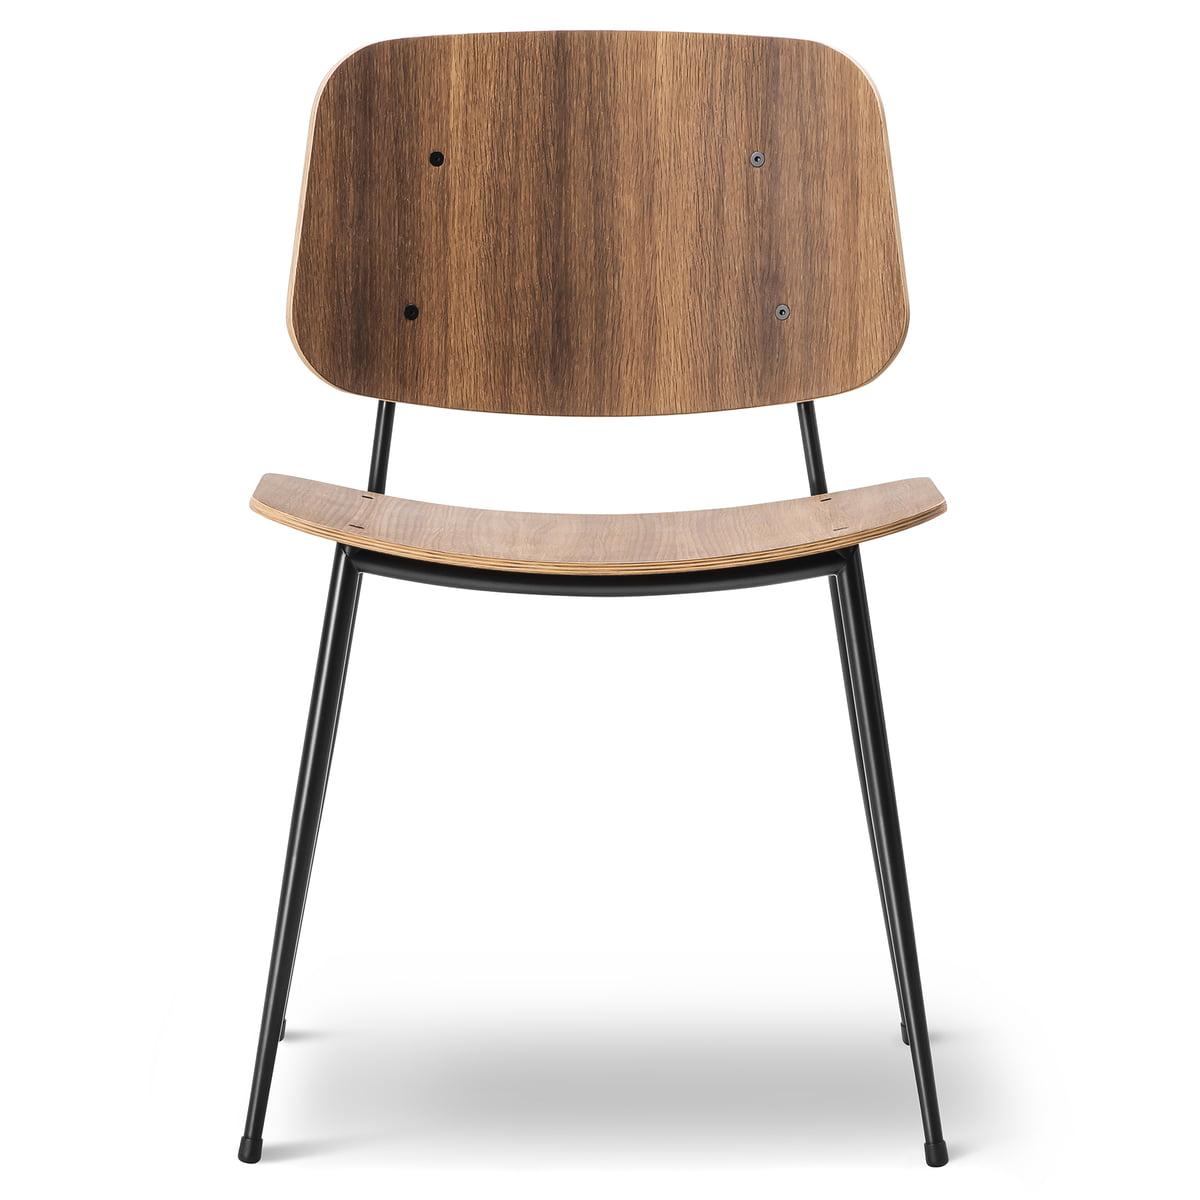 S borg stuhl model 3060 von fredericia for Stuhl metallbeine